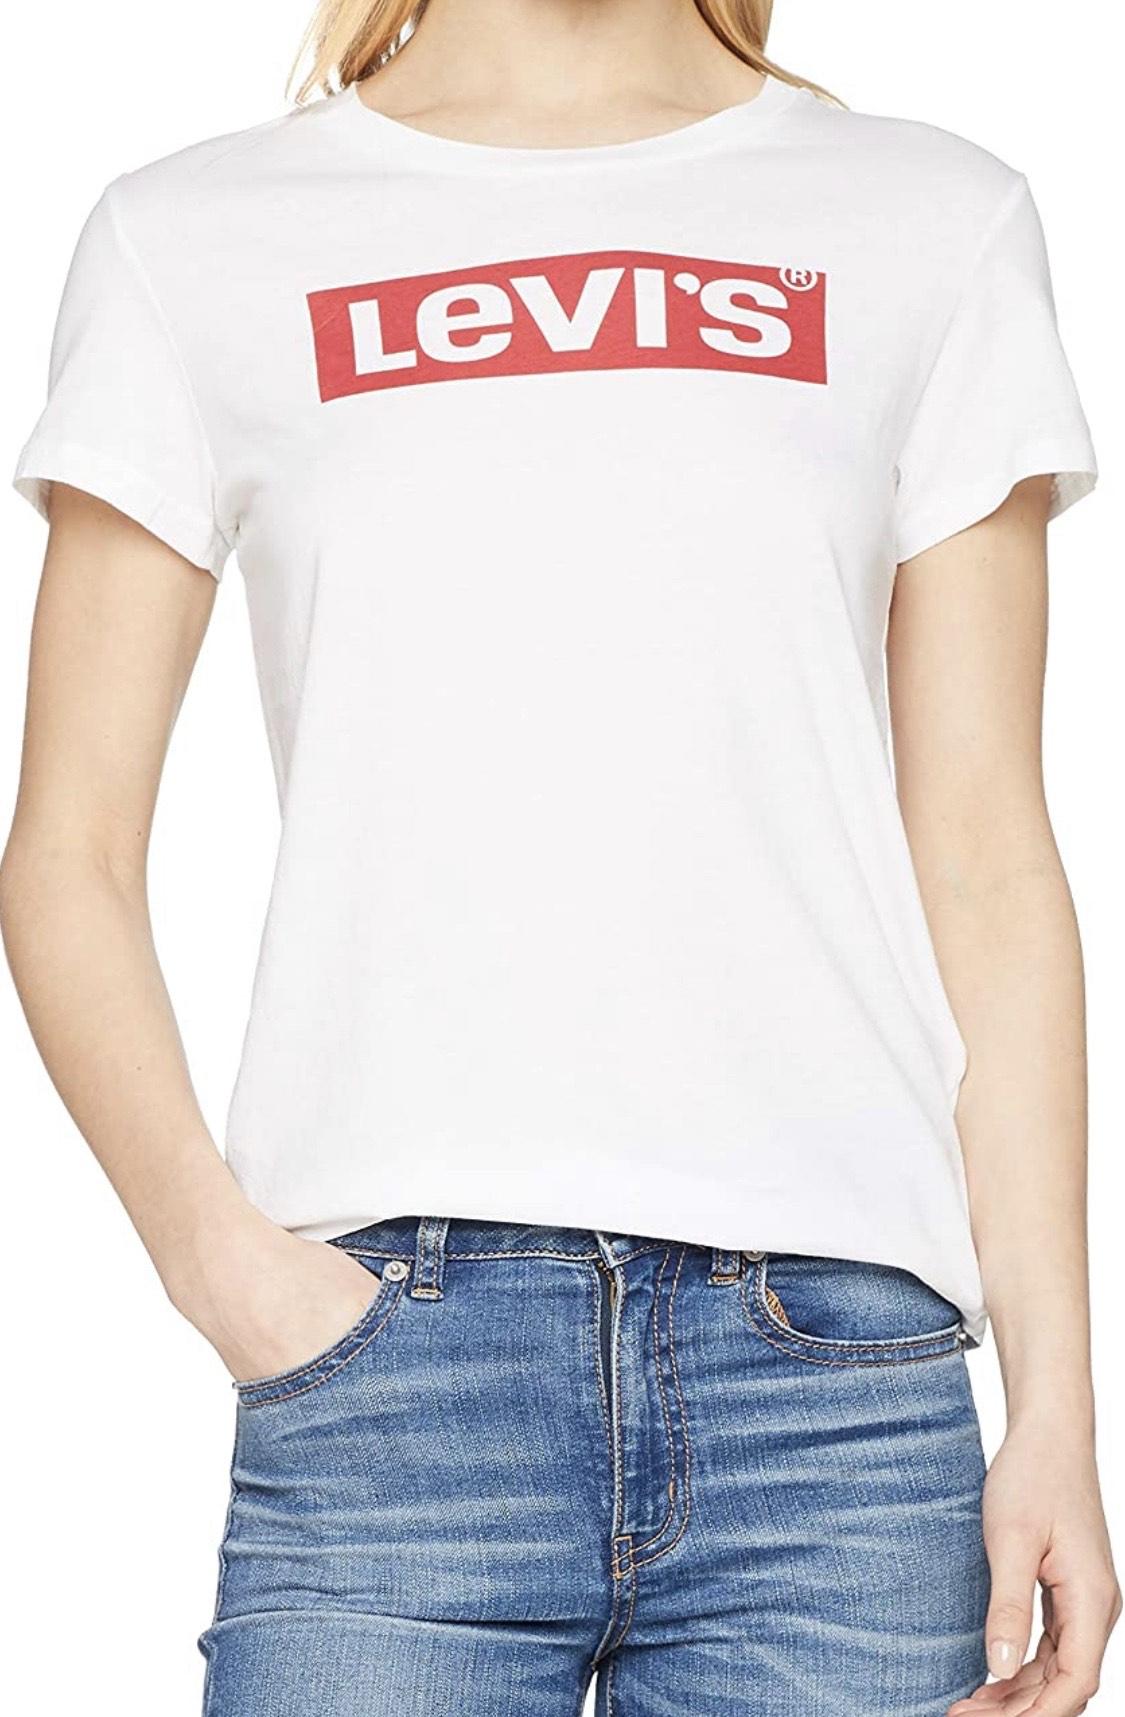 Camiseta Levi's mujer